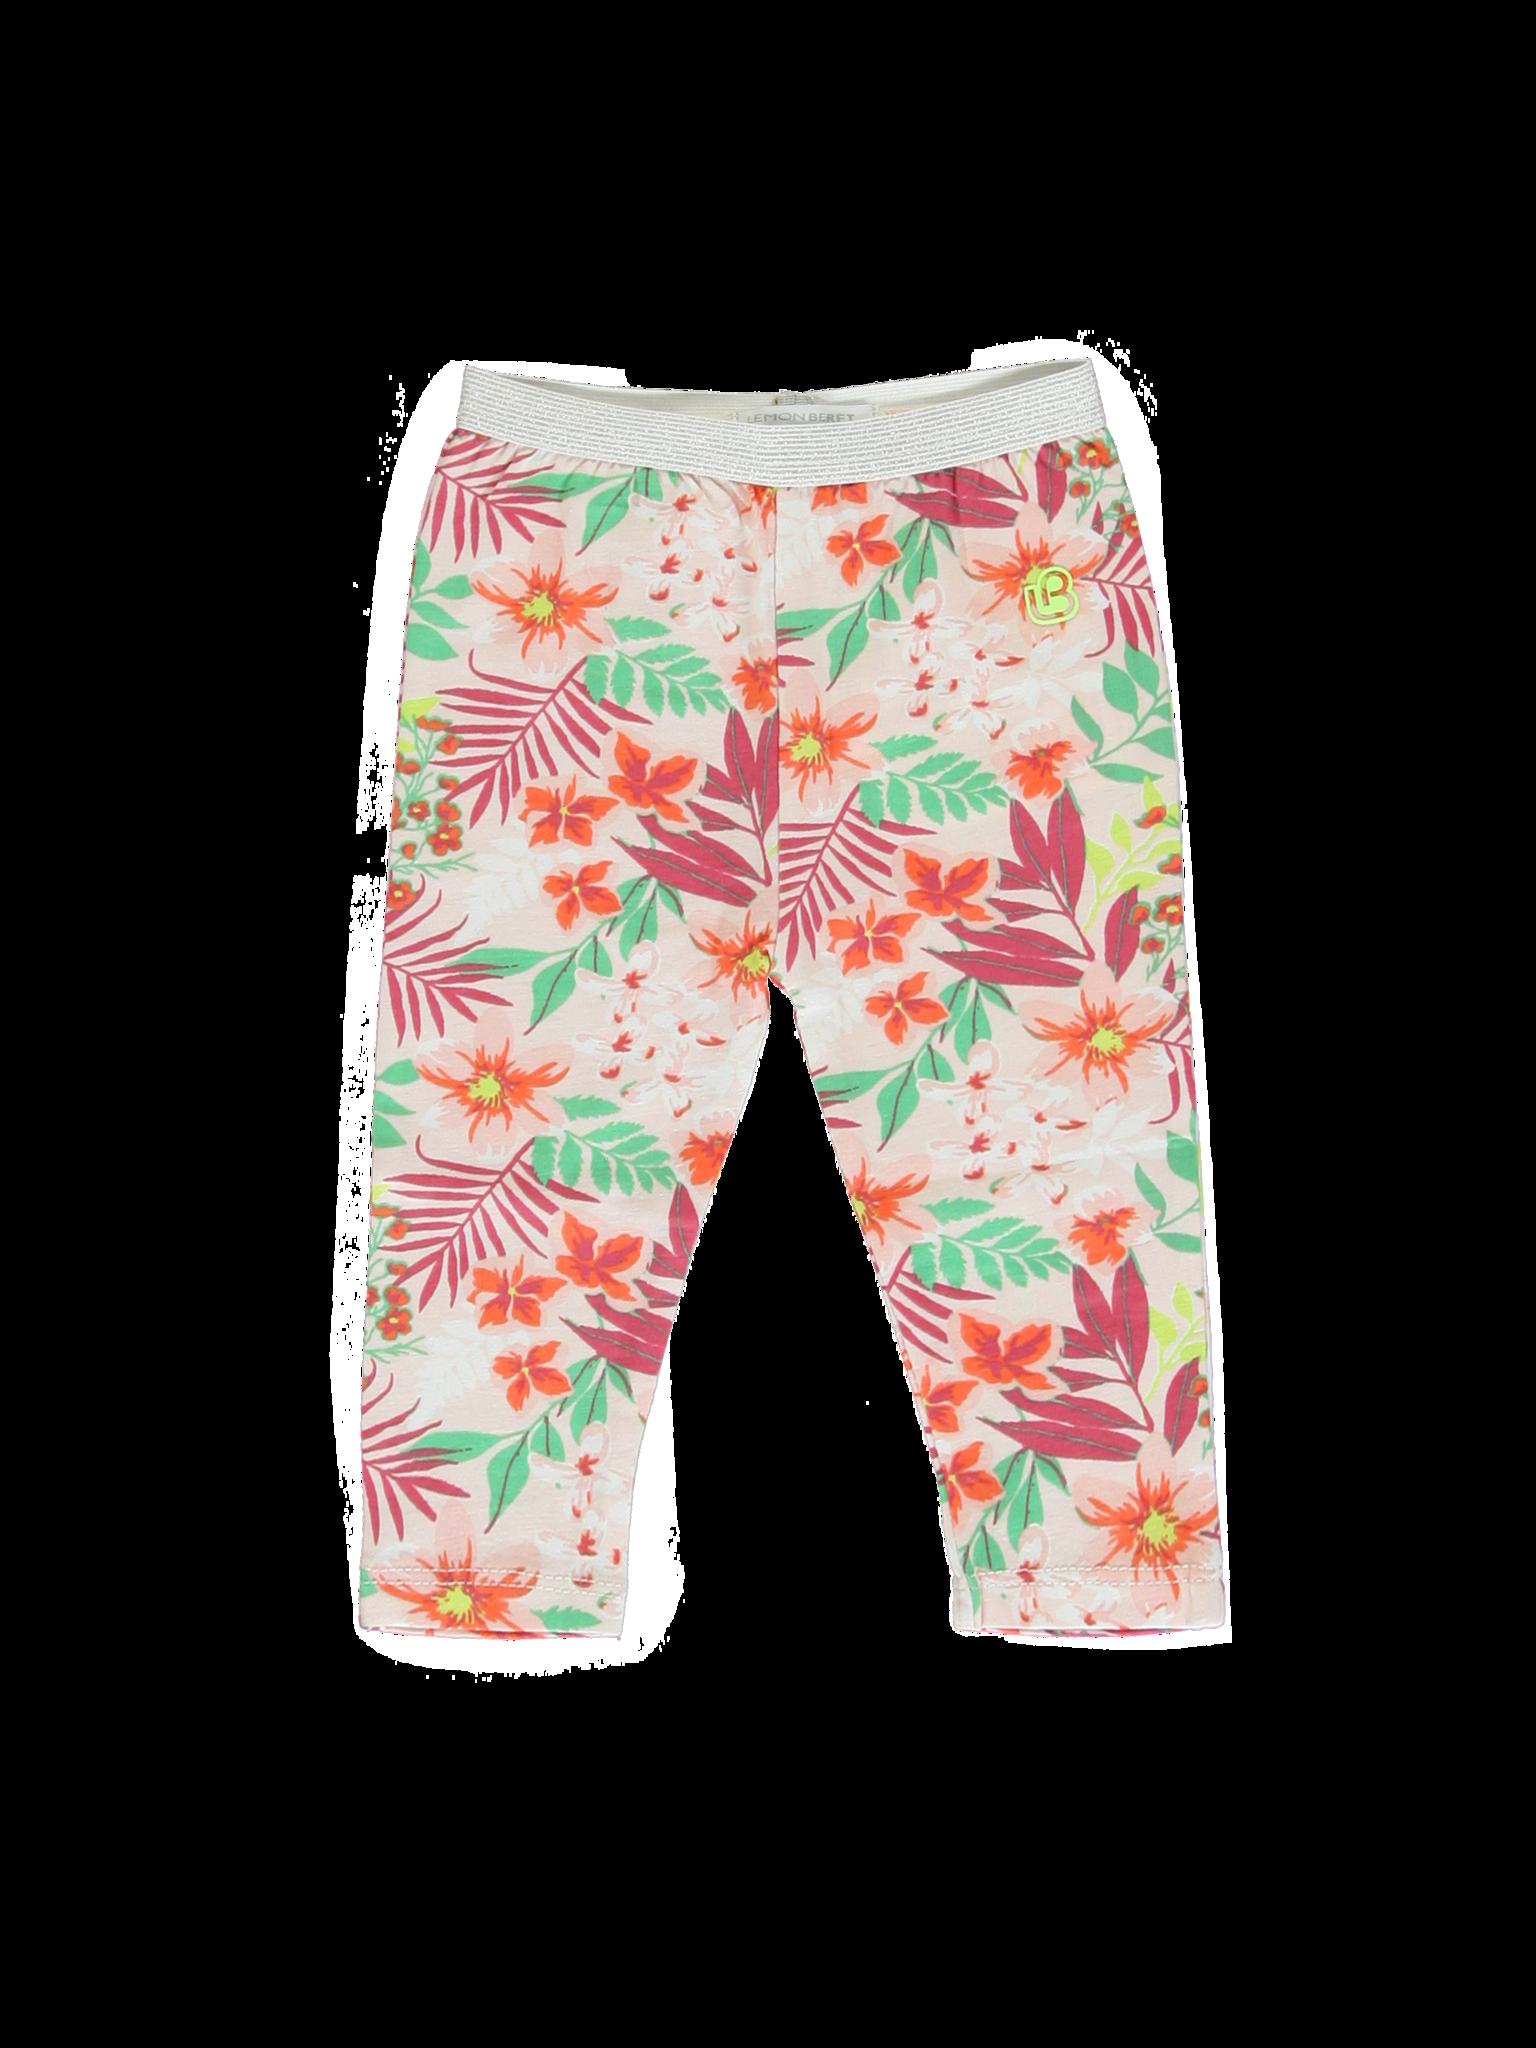 All Brands   Summerproducts Baby   Legging   8 pcs/box